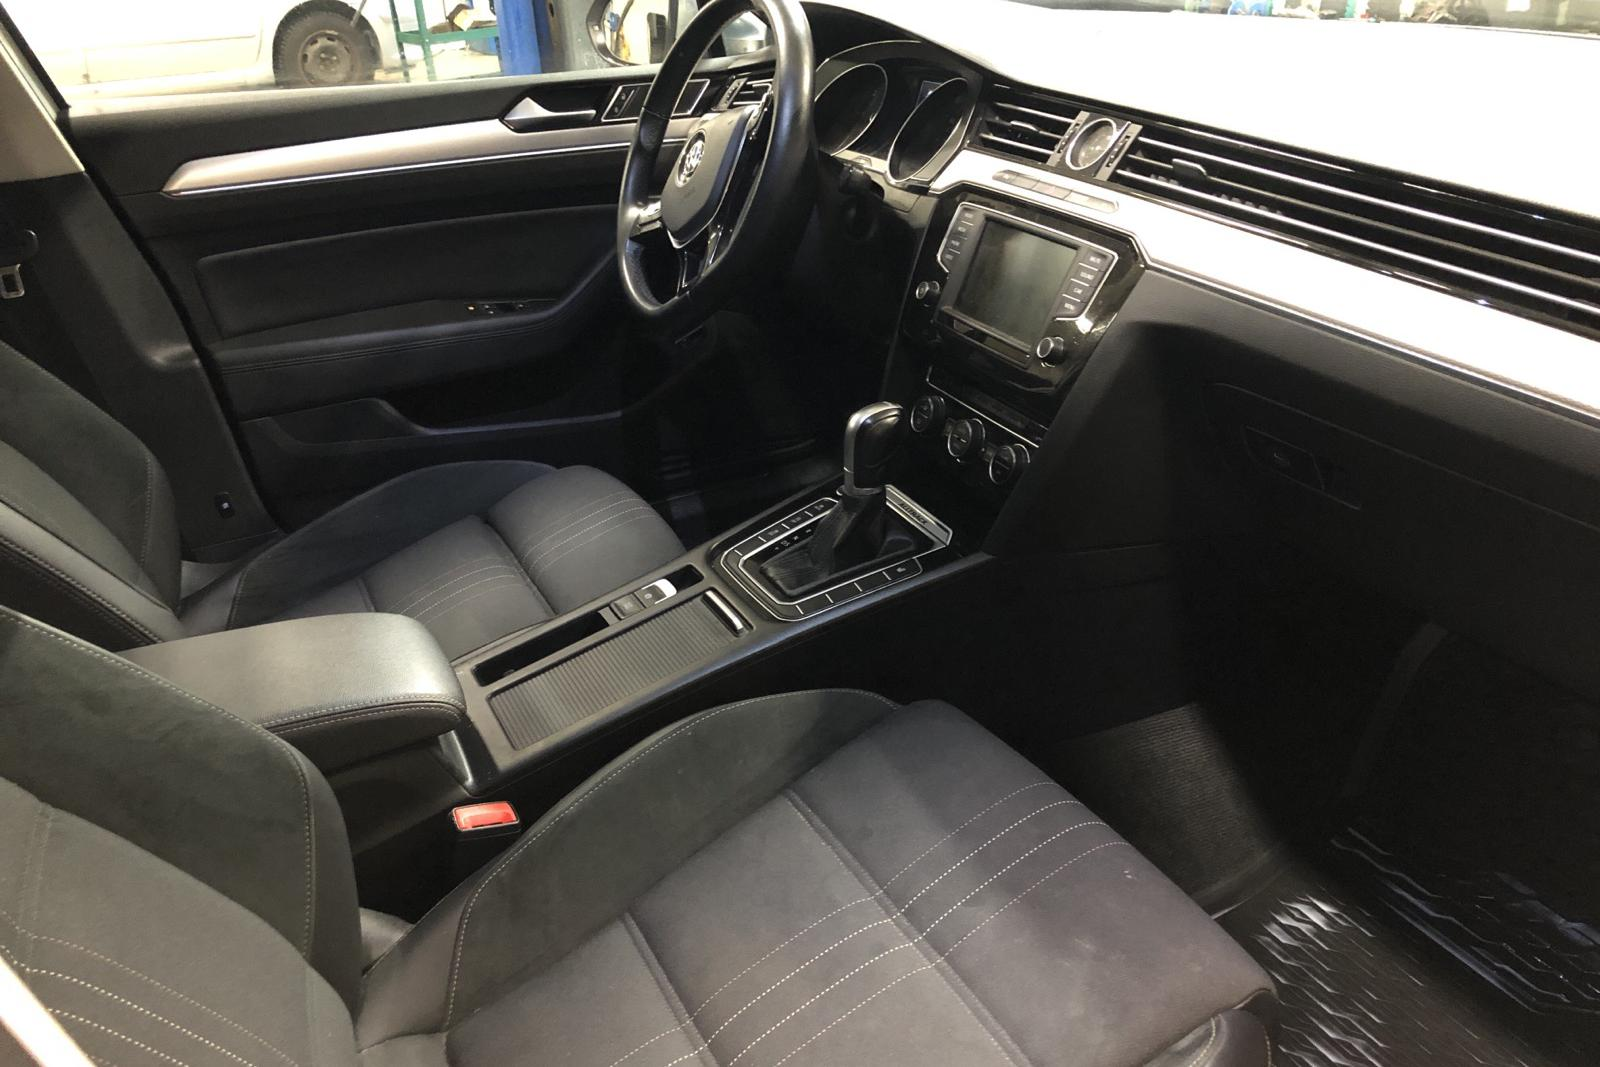 VW Passat Alltrack 2.0 TDI Sportscombi 4MOTION (190hk) - 14 427 mil - Automat - vit - 2017